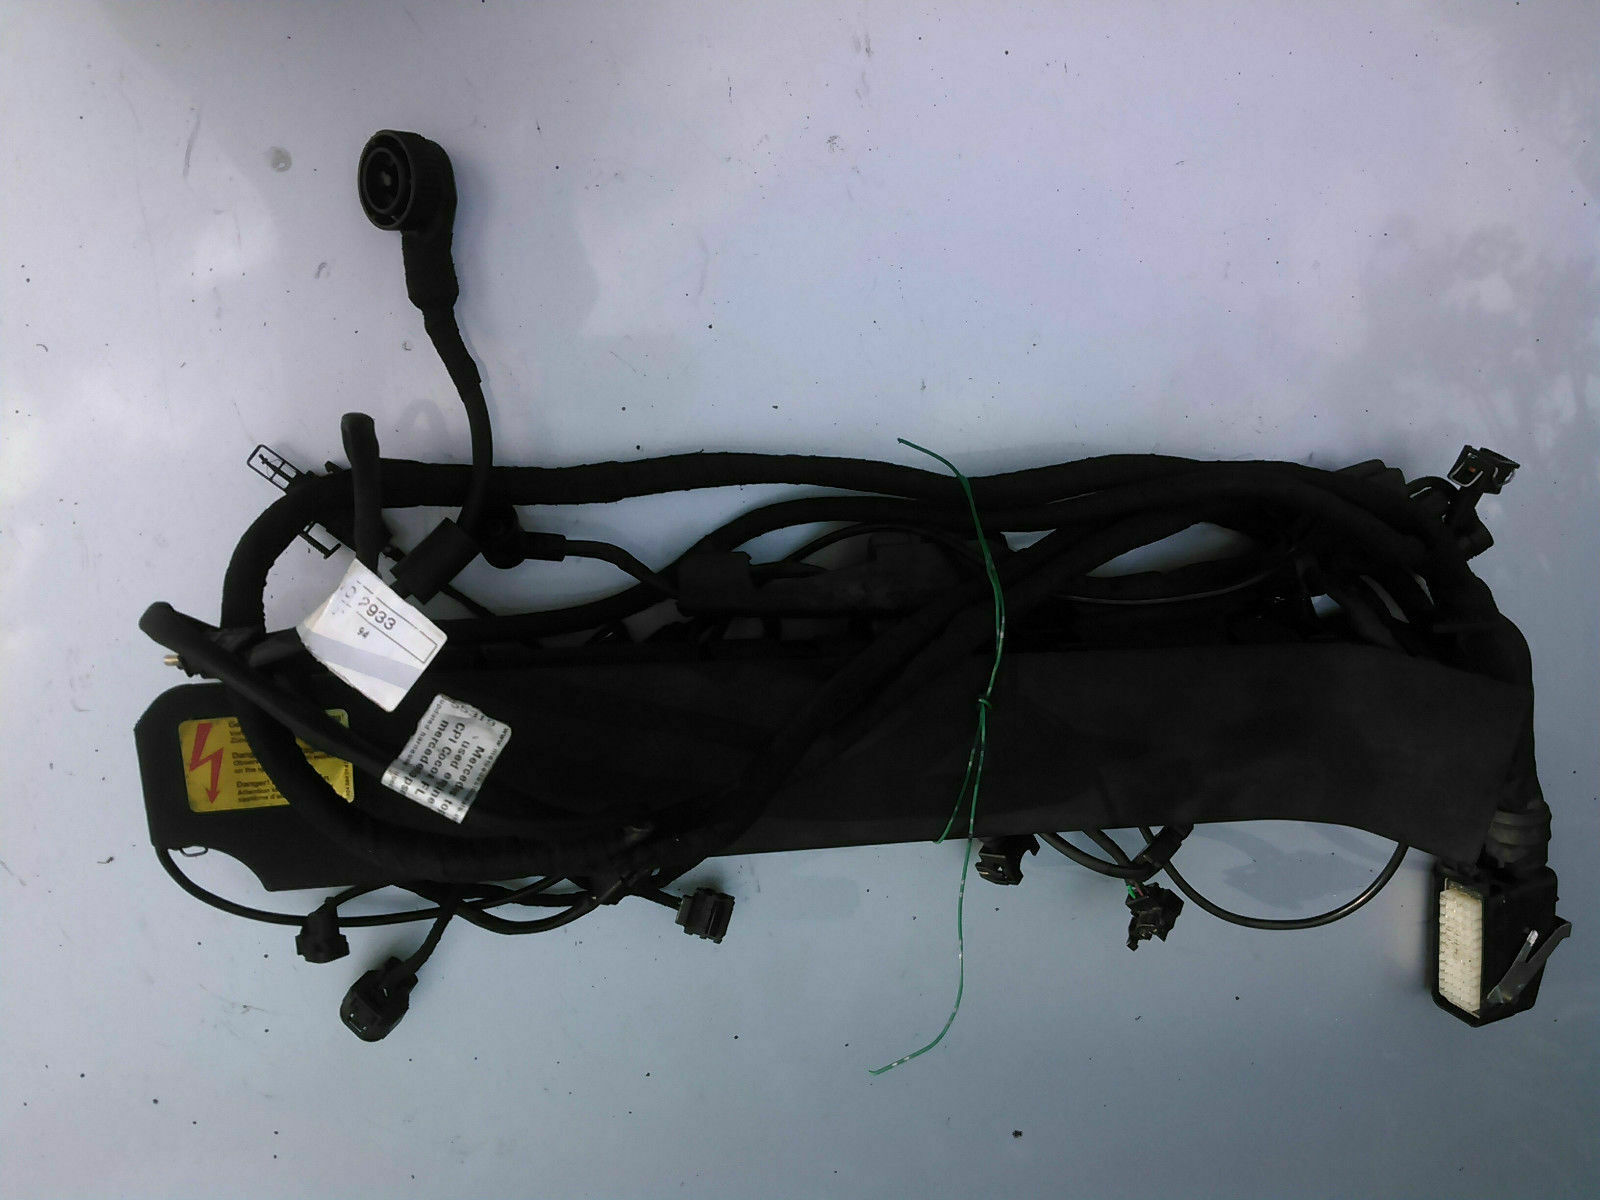 [SCHEMATICS_48IU]  MERCEDES E320 Engine Injector Wiring Harness Updated Delphi 1244402933 for  sale online   eBay   Delphi Wiring Harness      eBay